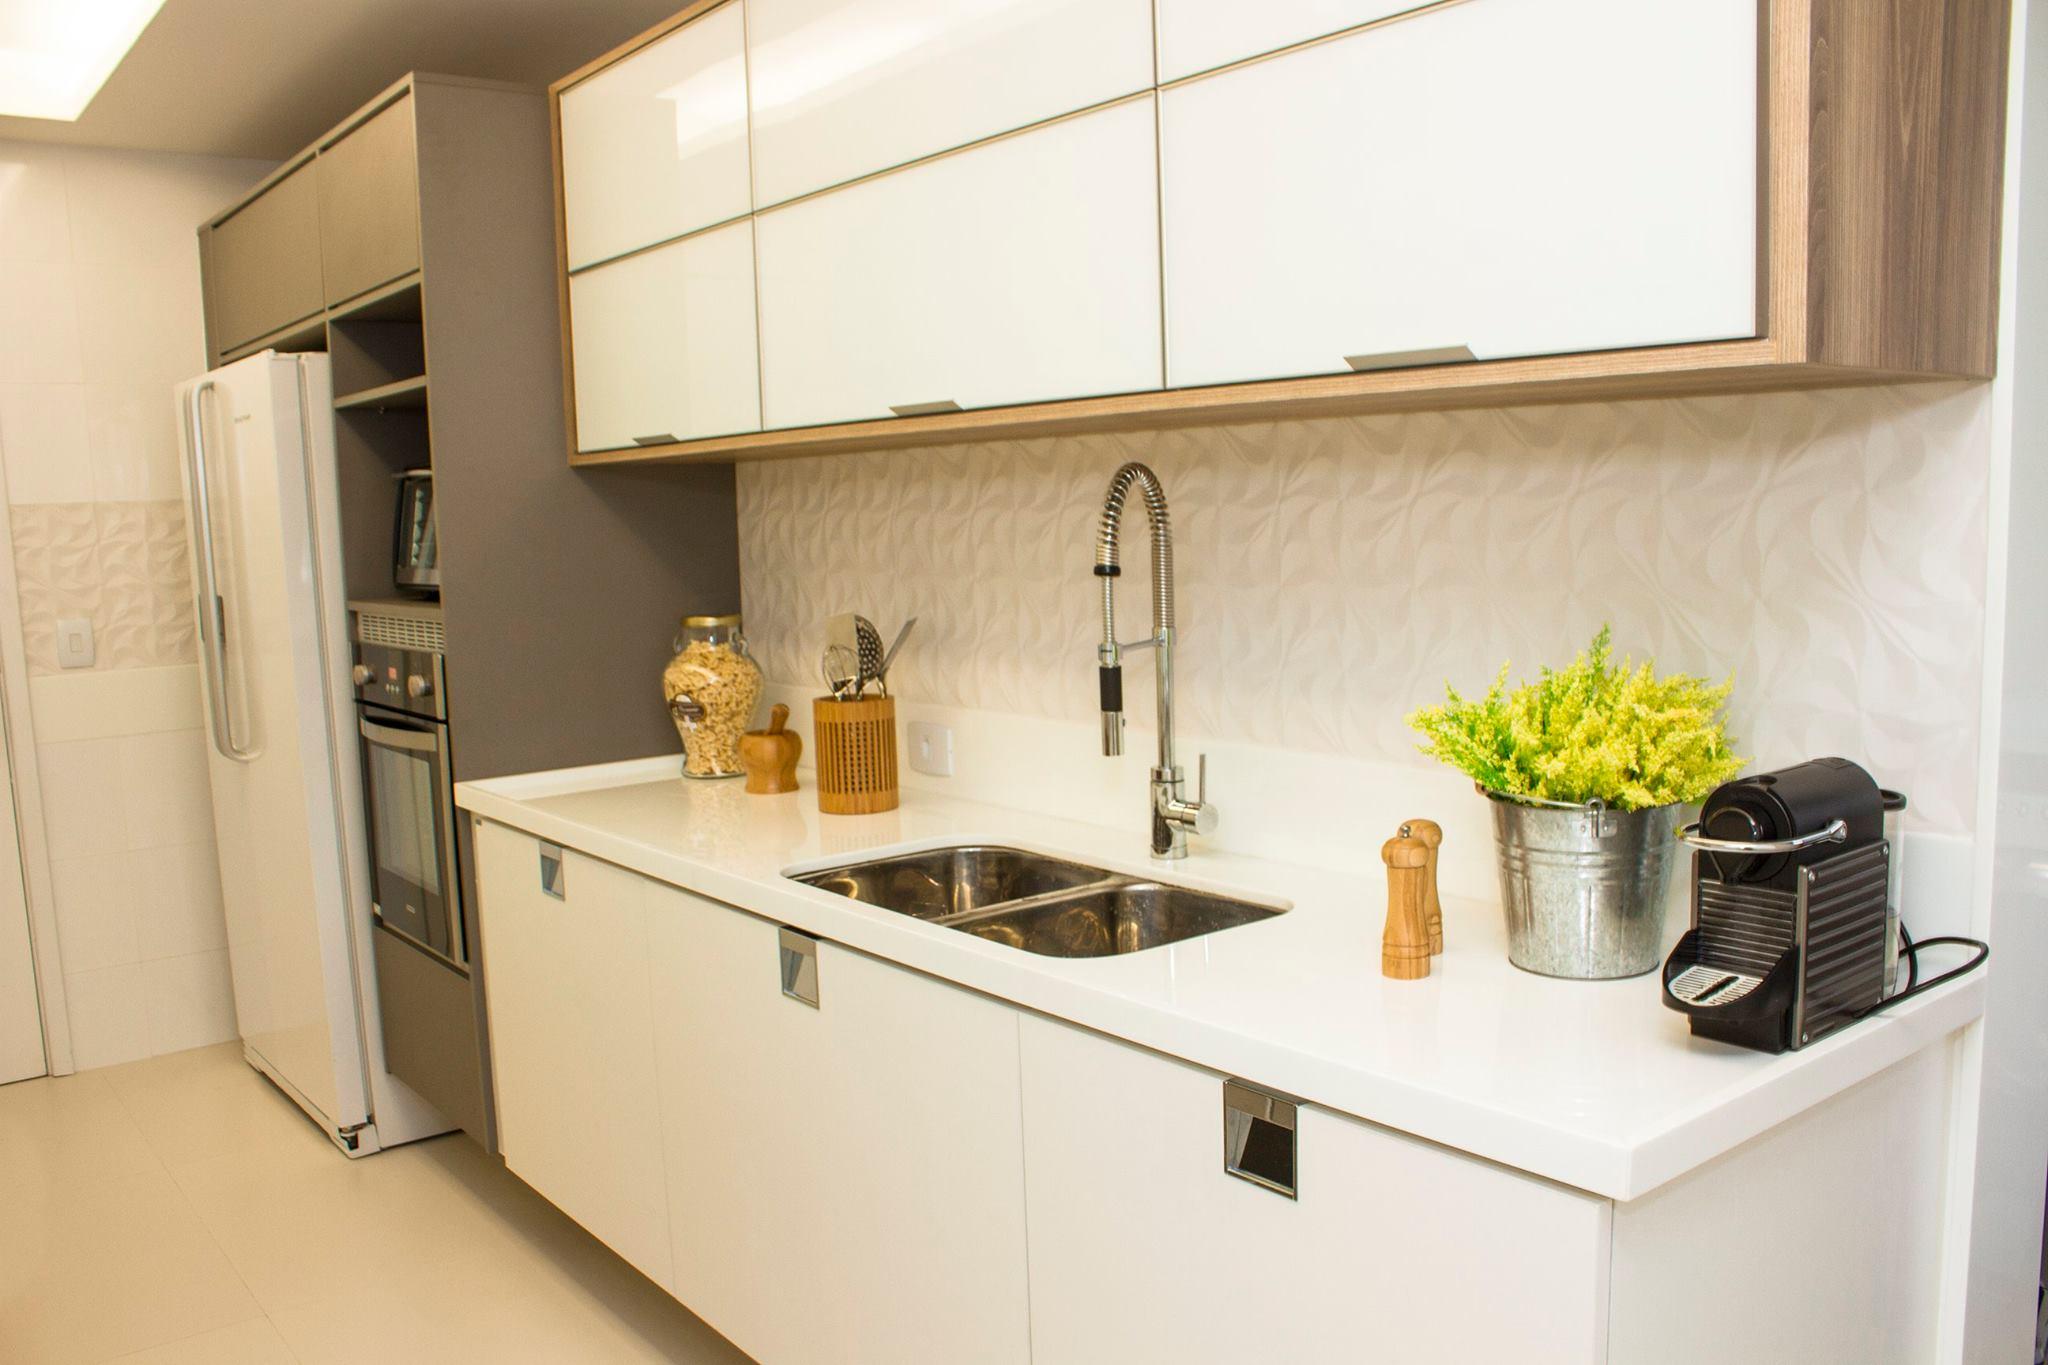 1-Apartamento na Barra da Tijuca - Arquiteta Gabriela Goltz